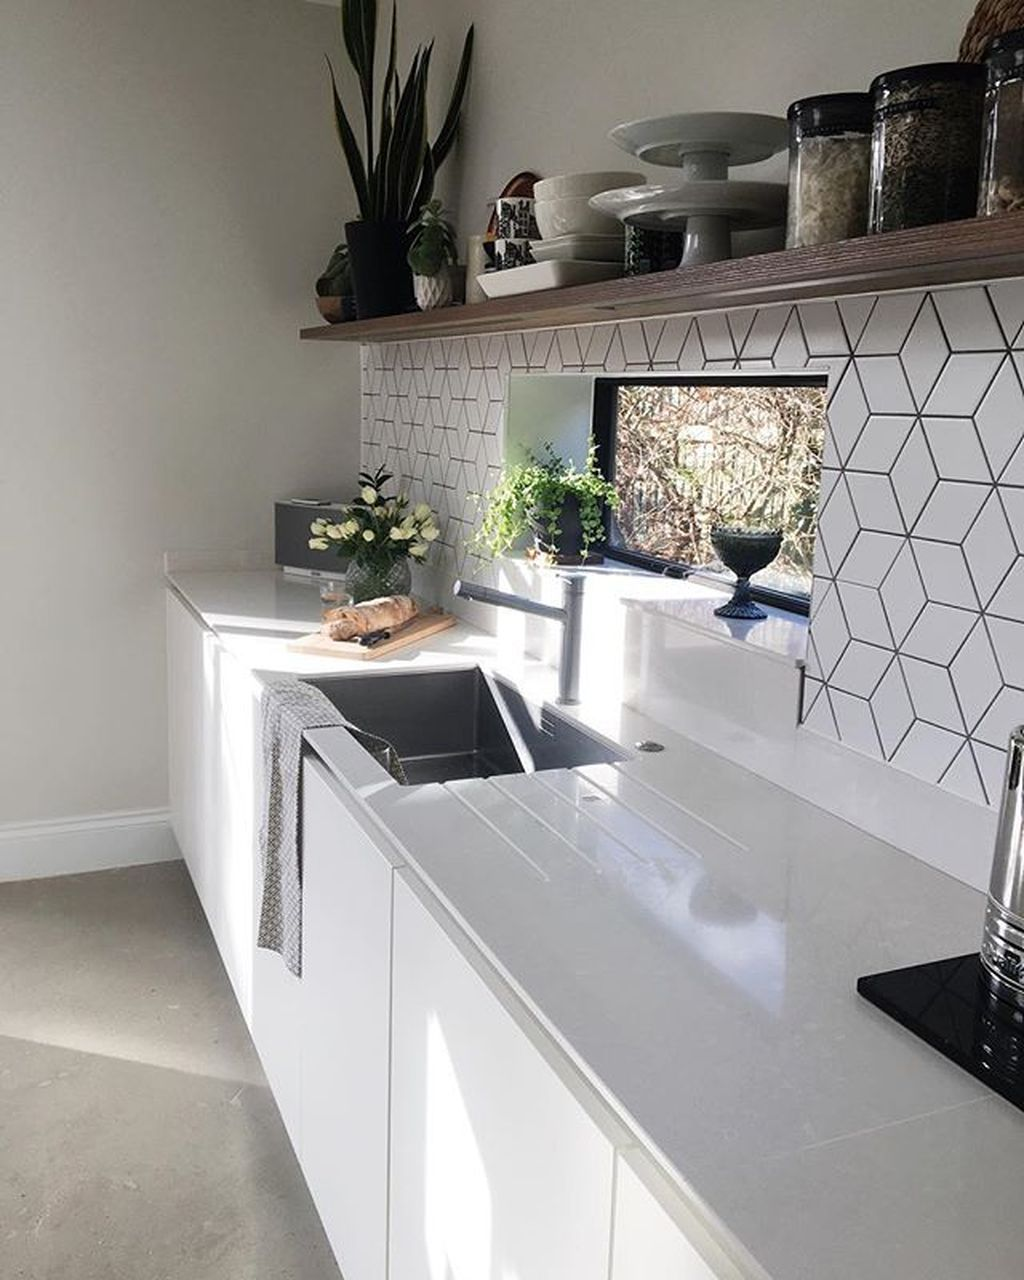 55 stunning geometric backsplash tile kitchen ideas kitchen tiles home kitchens kitchen on kitchen interior tiles id=64332